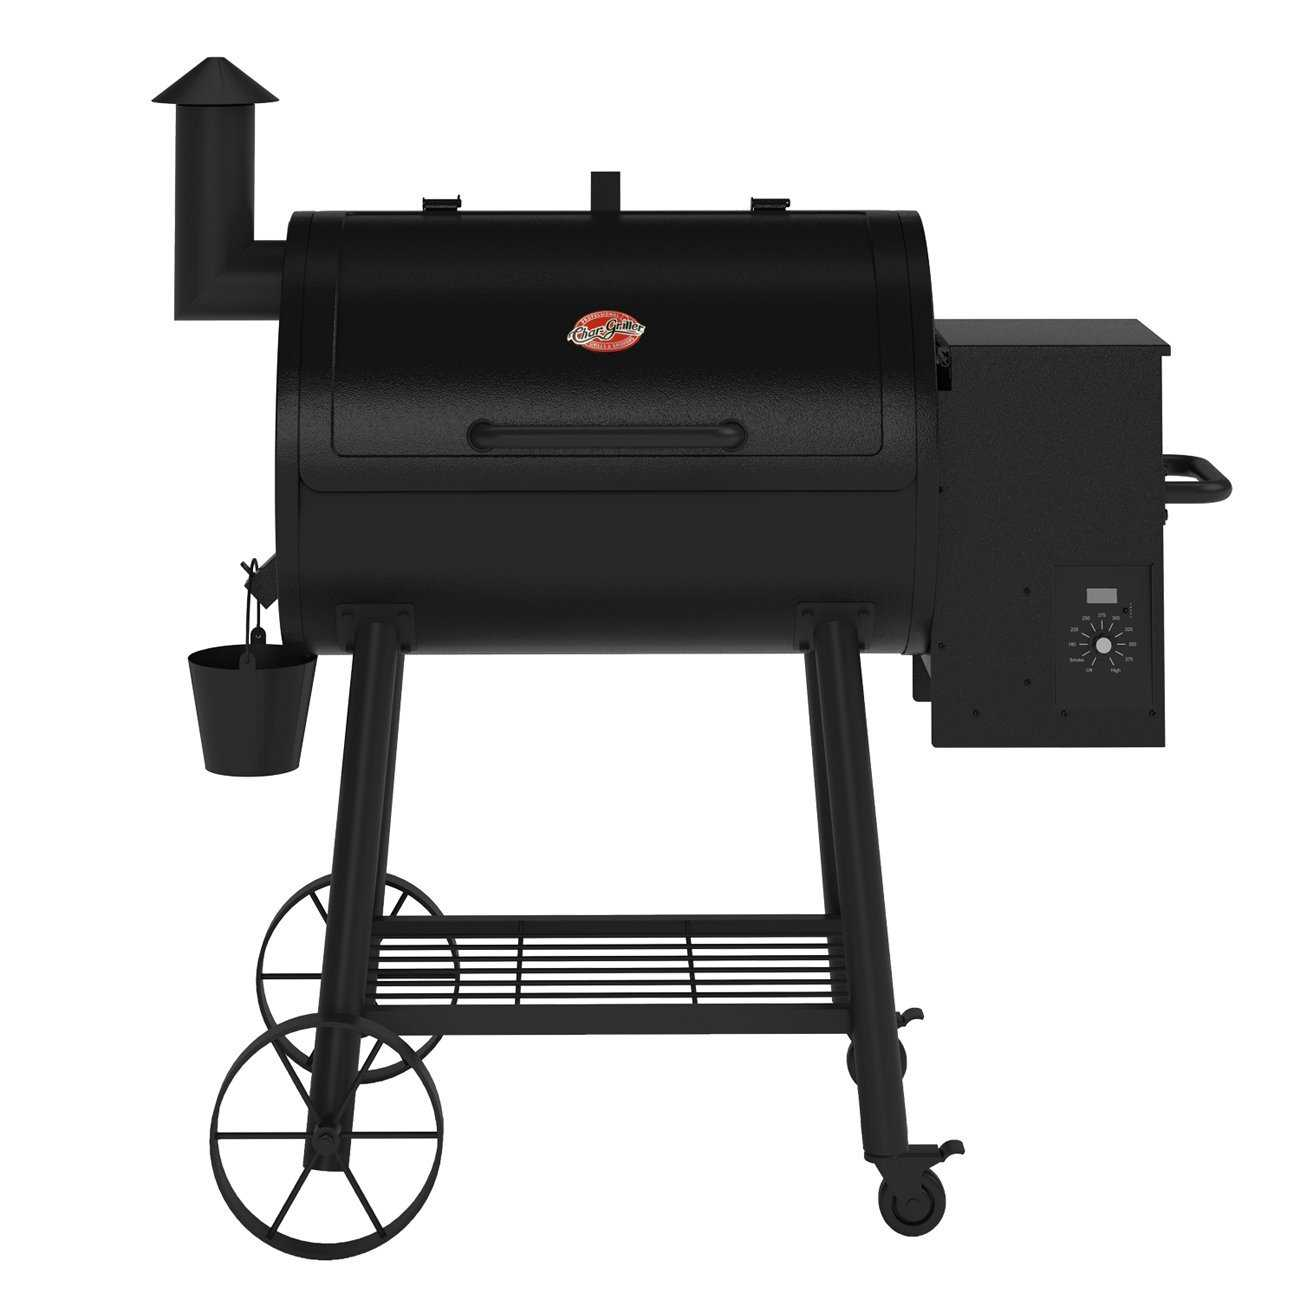 Char-Griller 9040 Wood Fire Pro Pellet Grill at Sutherlands